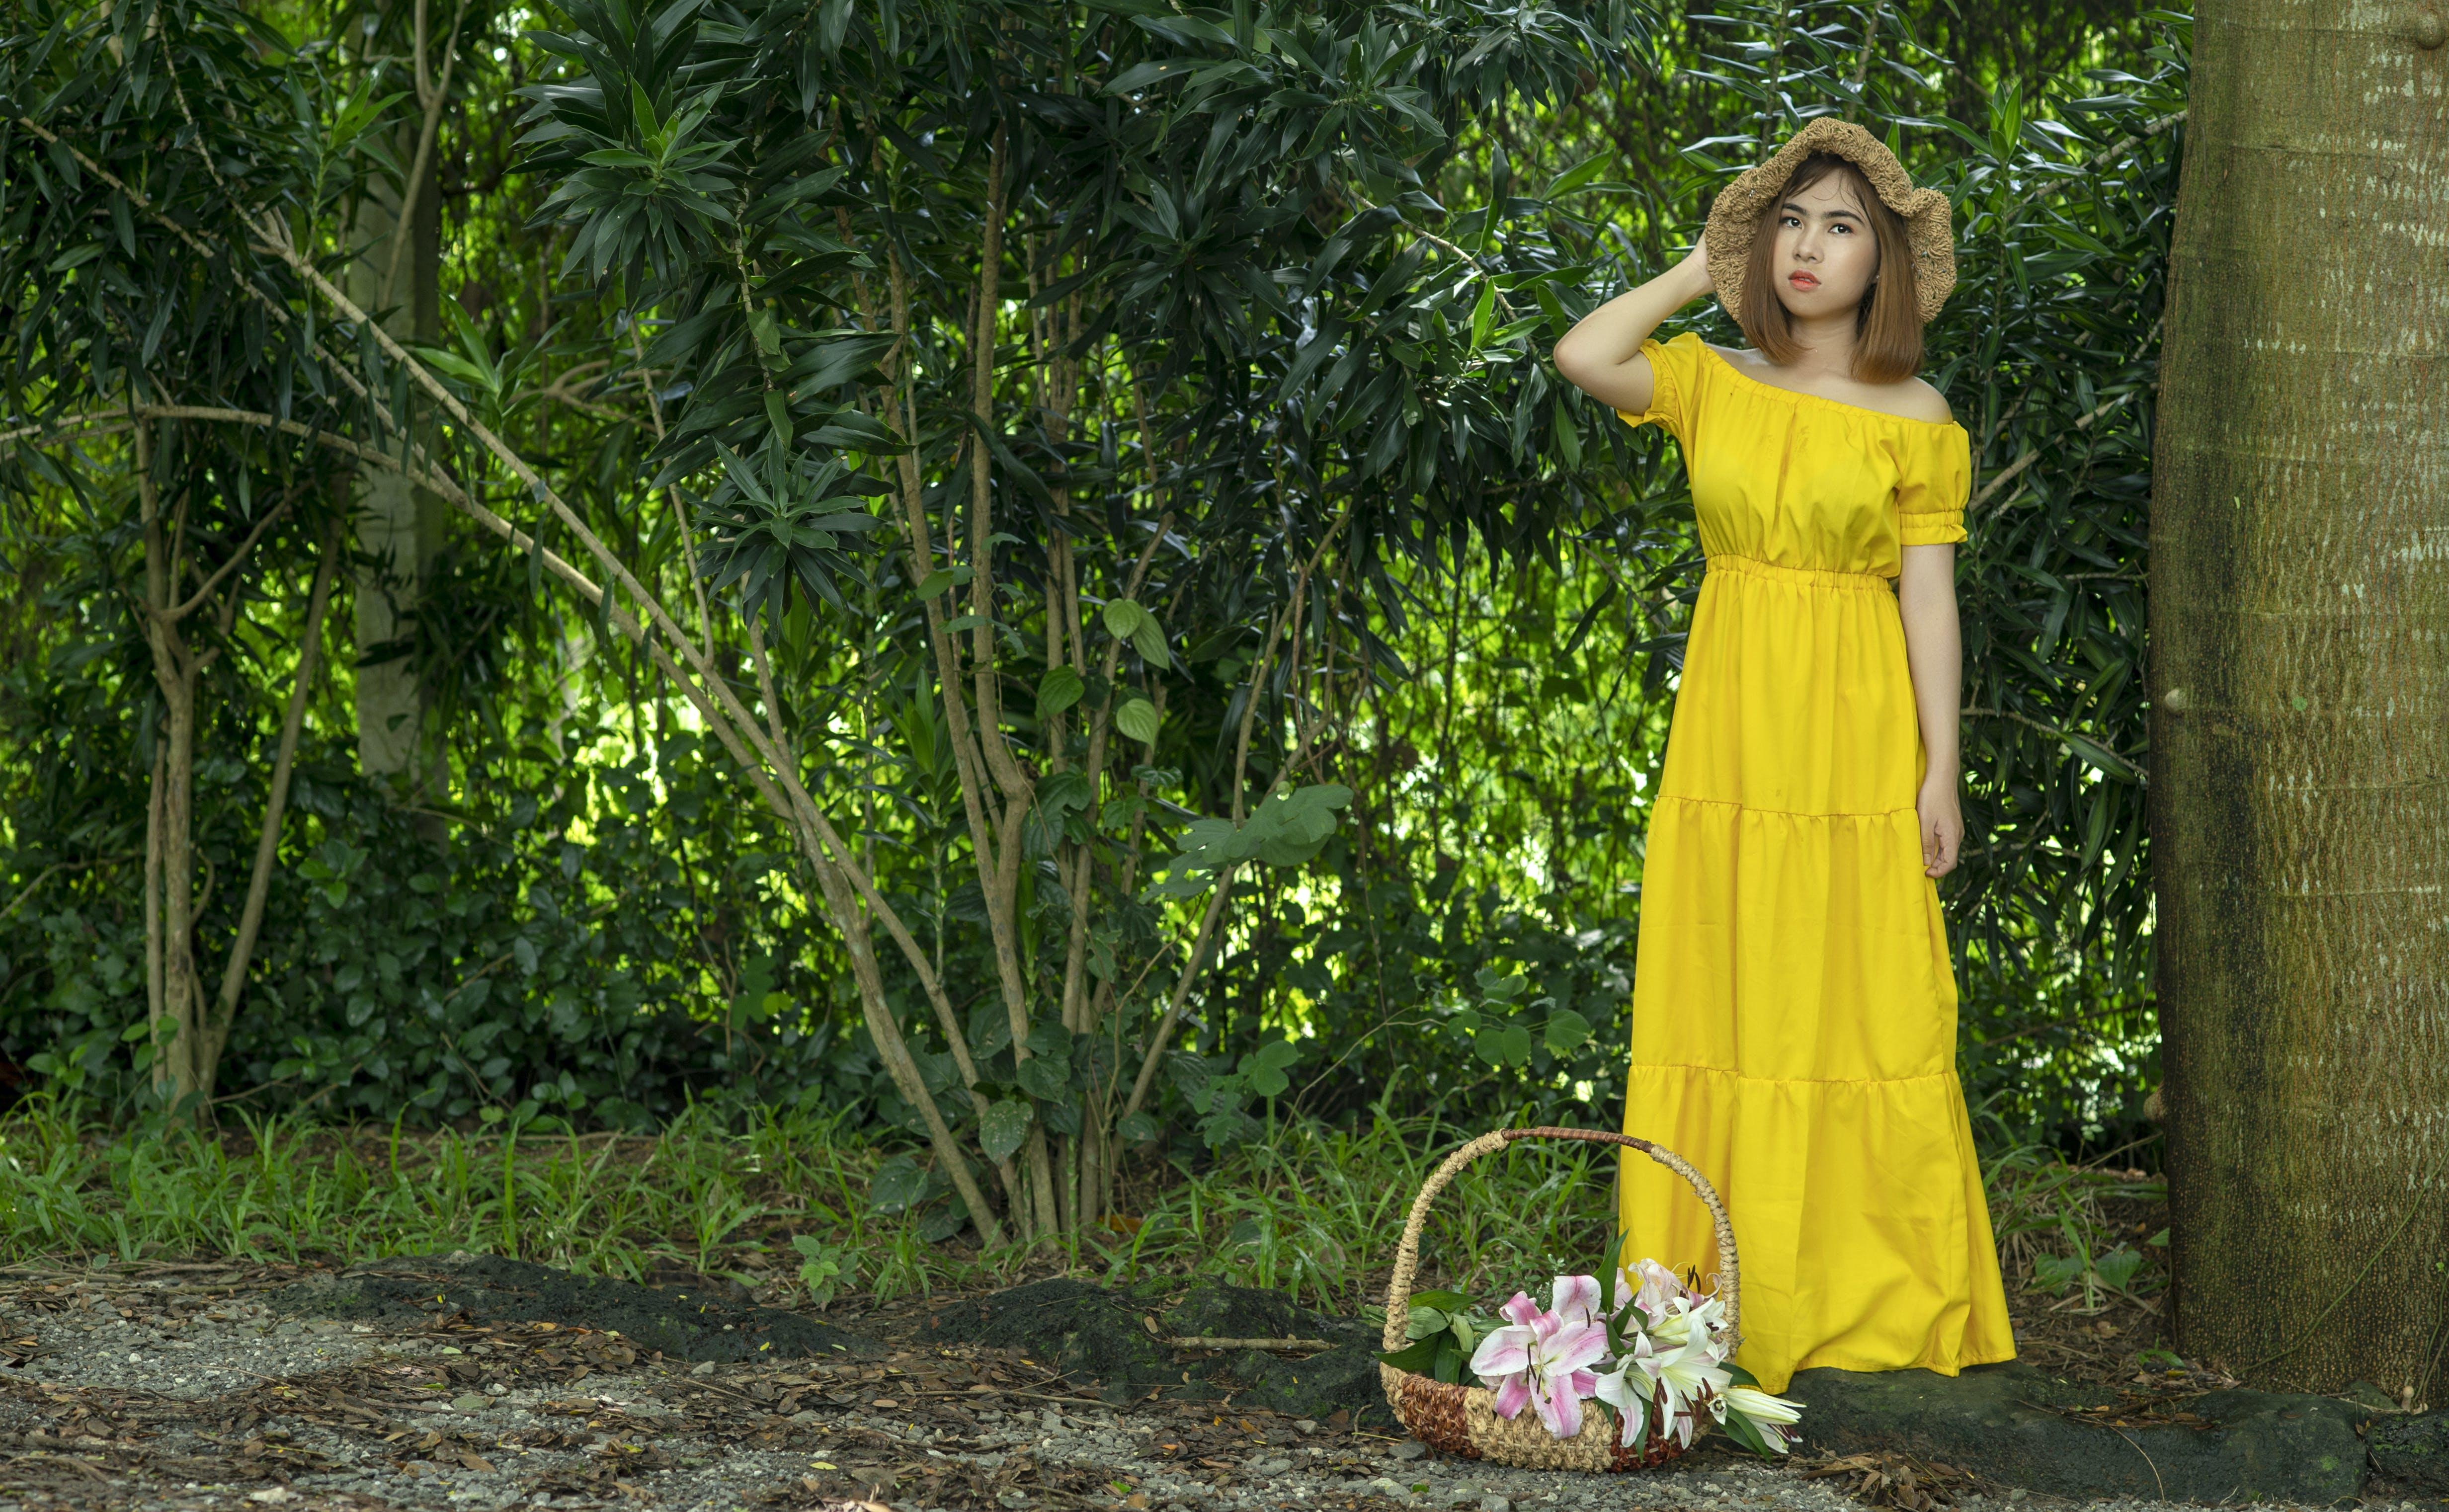 Woman Wearing Yellow Dress Beside Basket With Flowers